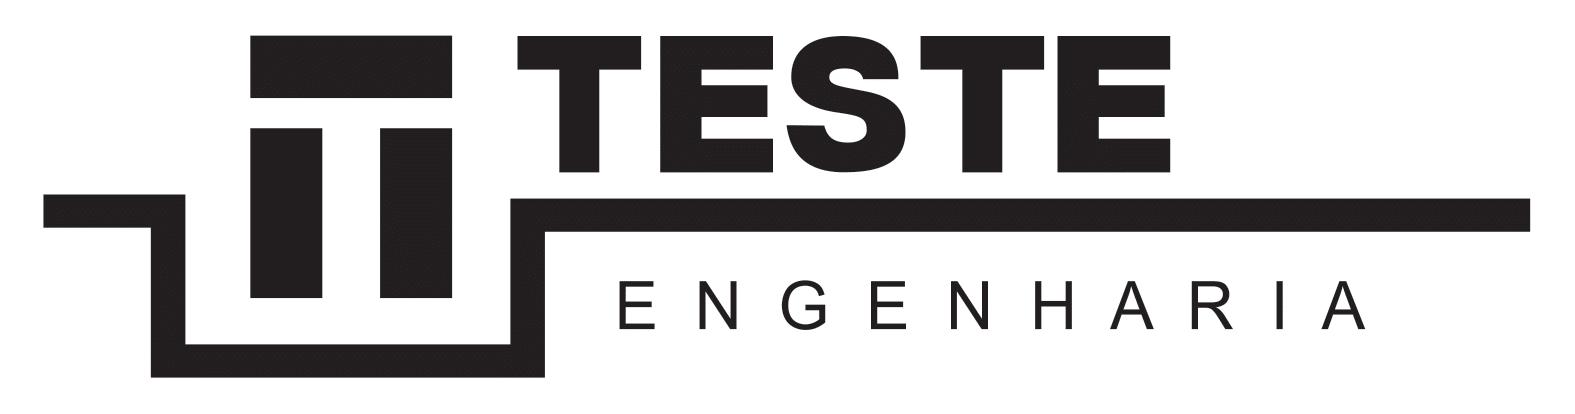 Teste Engenharia